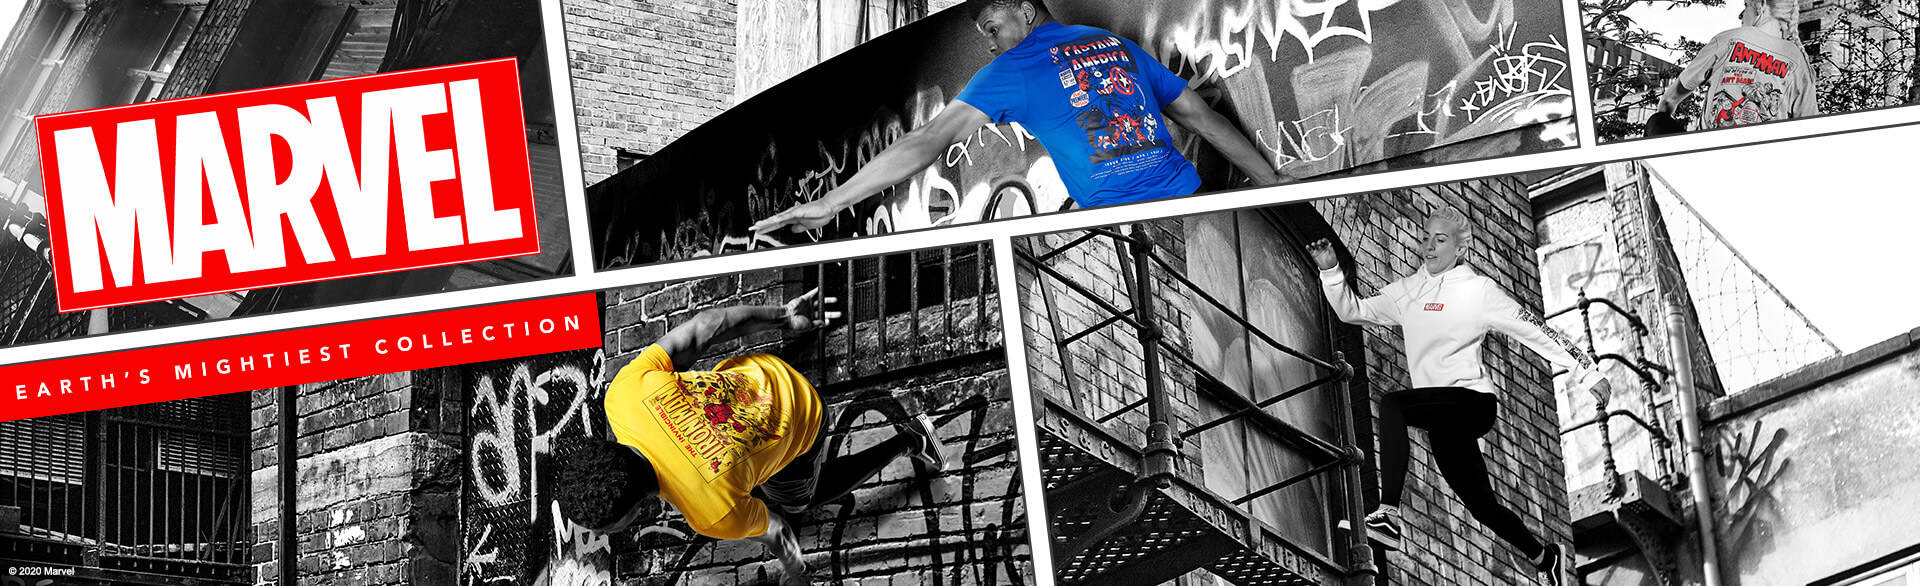 banner promozione zavvi t-shirt marvel